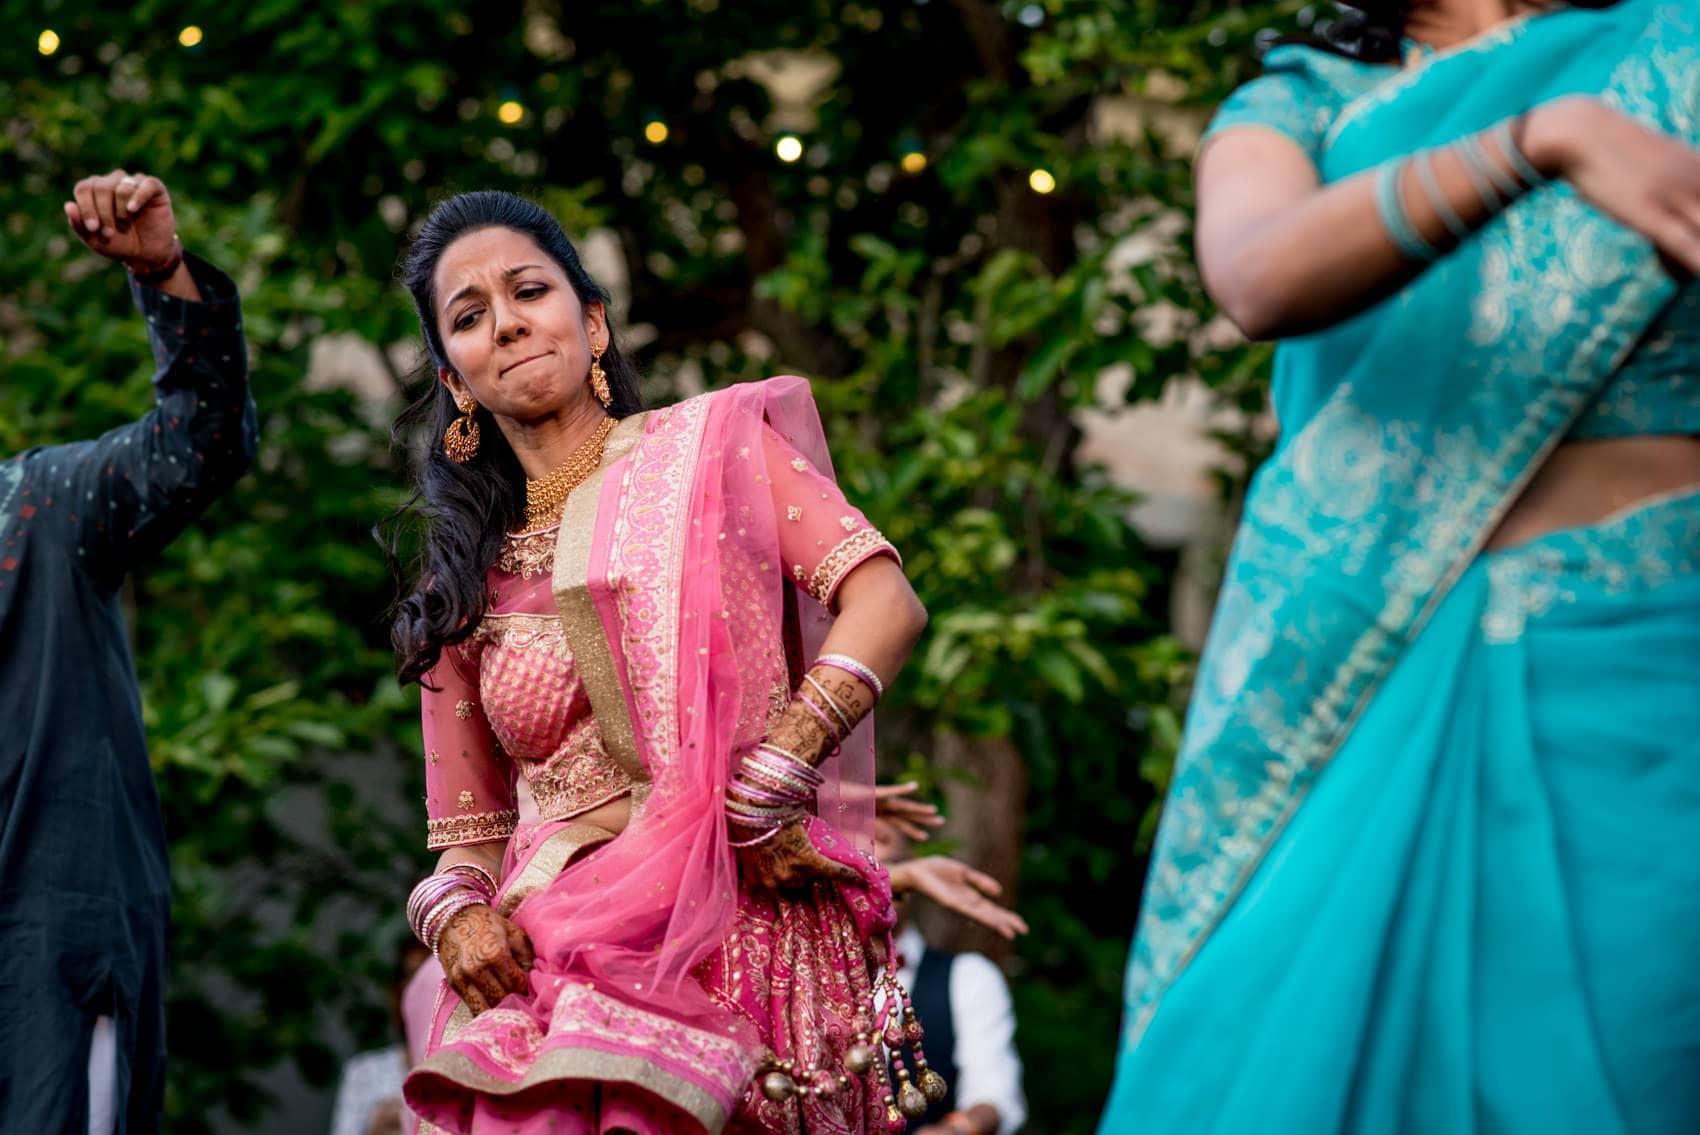 A florence wedding photographer capturing Indian dancing at Giardino Corsini al Prato